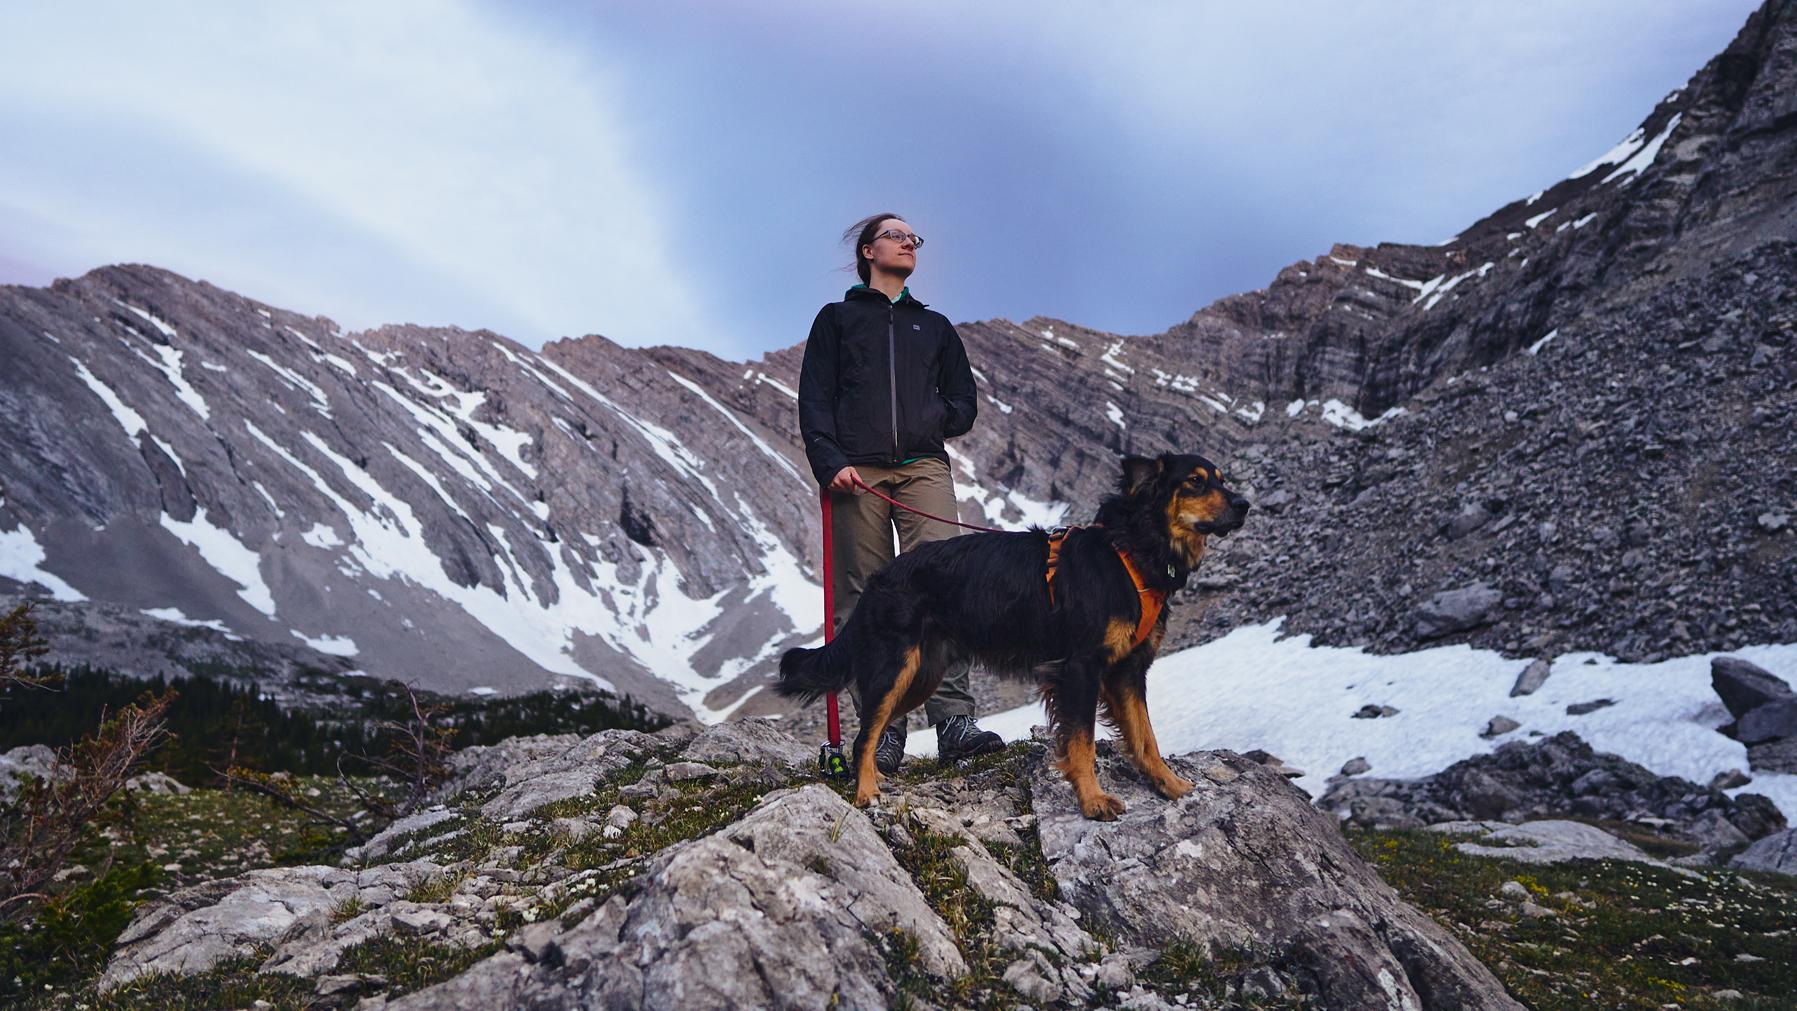 hiker in black mec jacket and black dog stand in front of lineham ridge in kananaskis